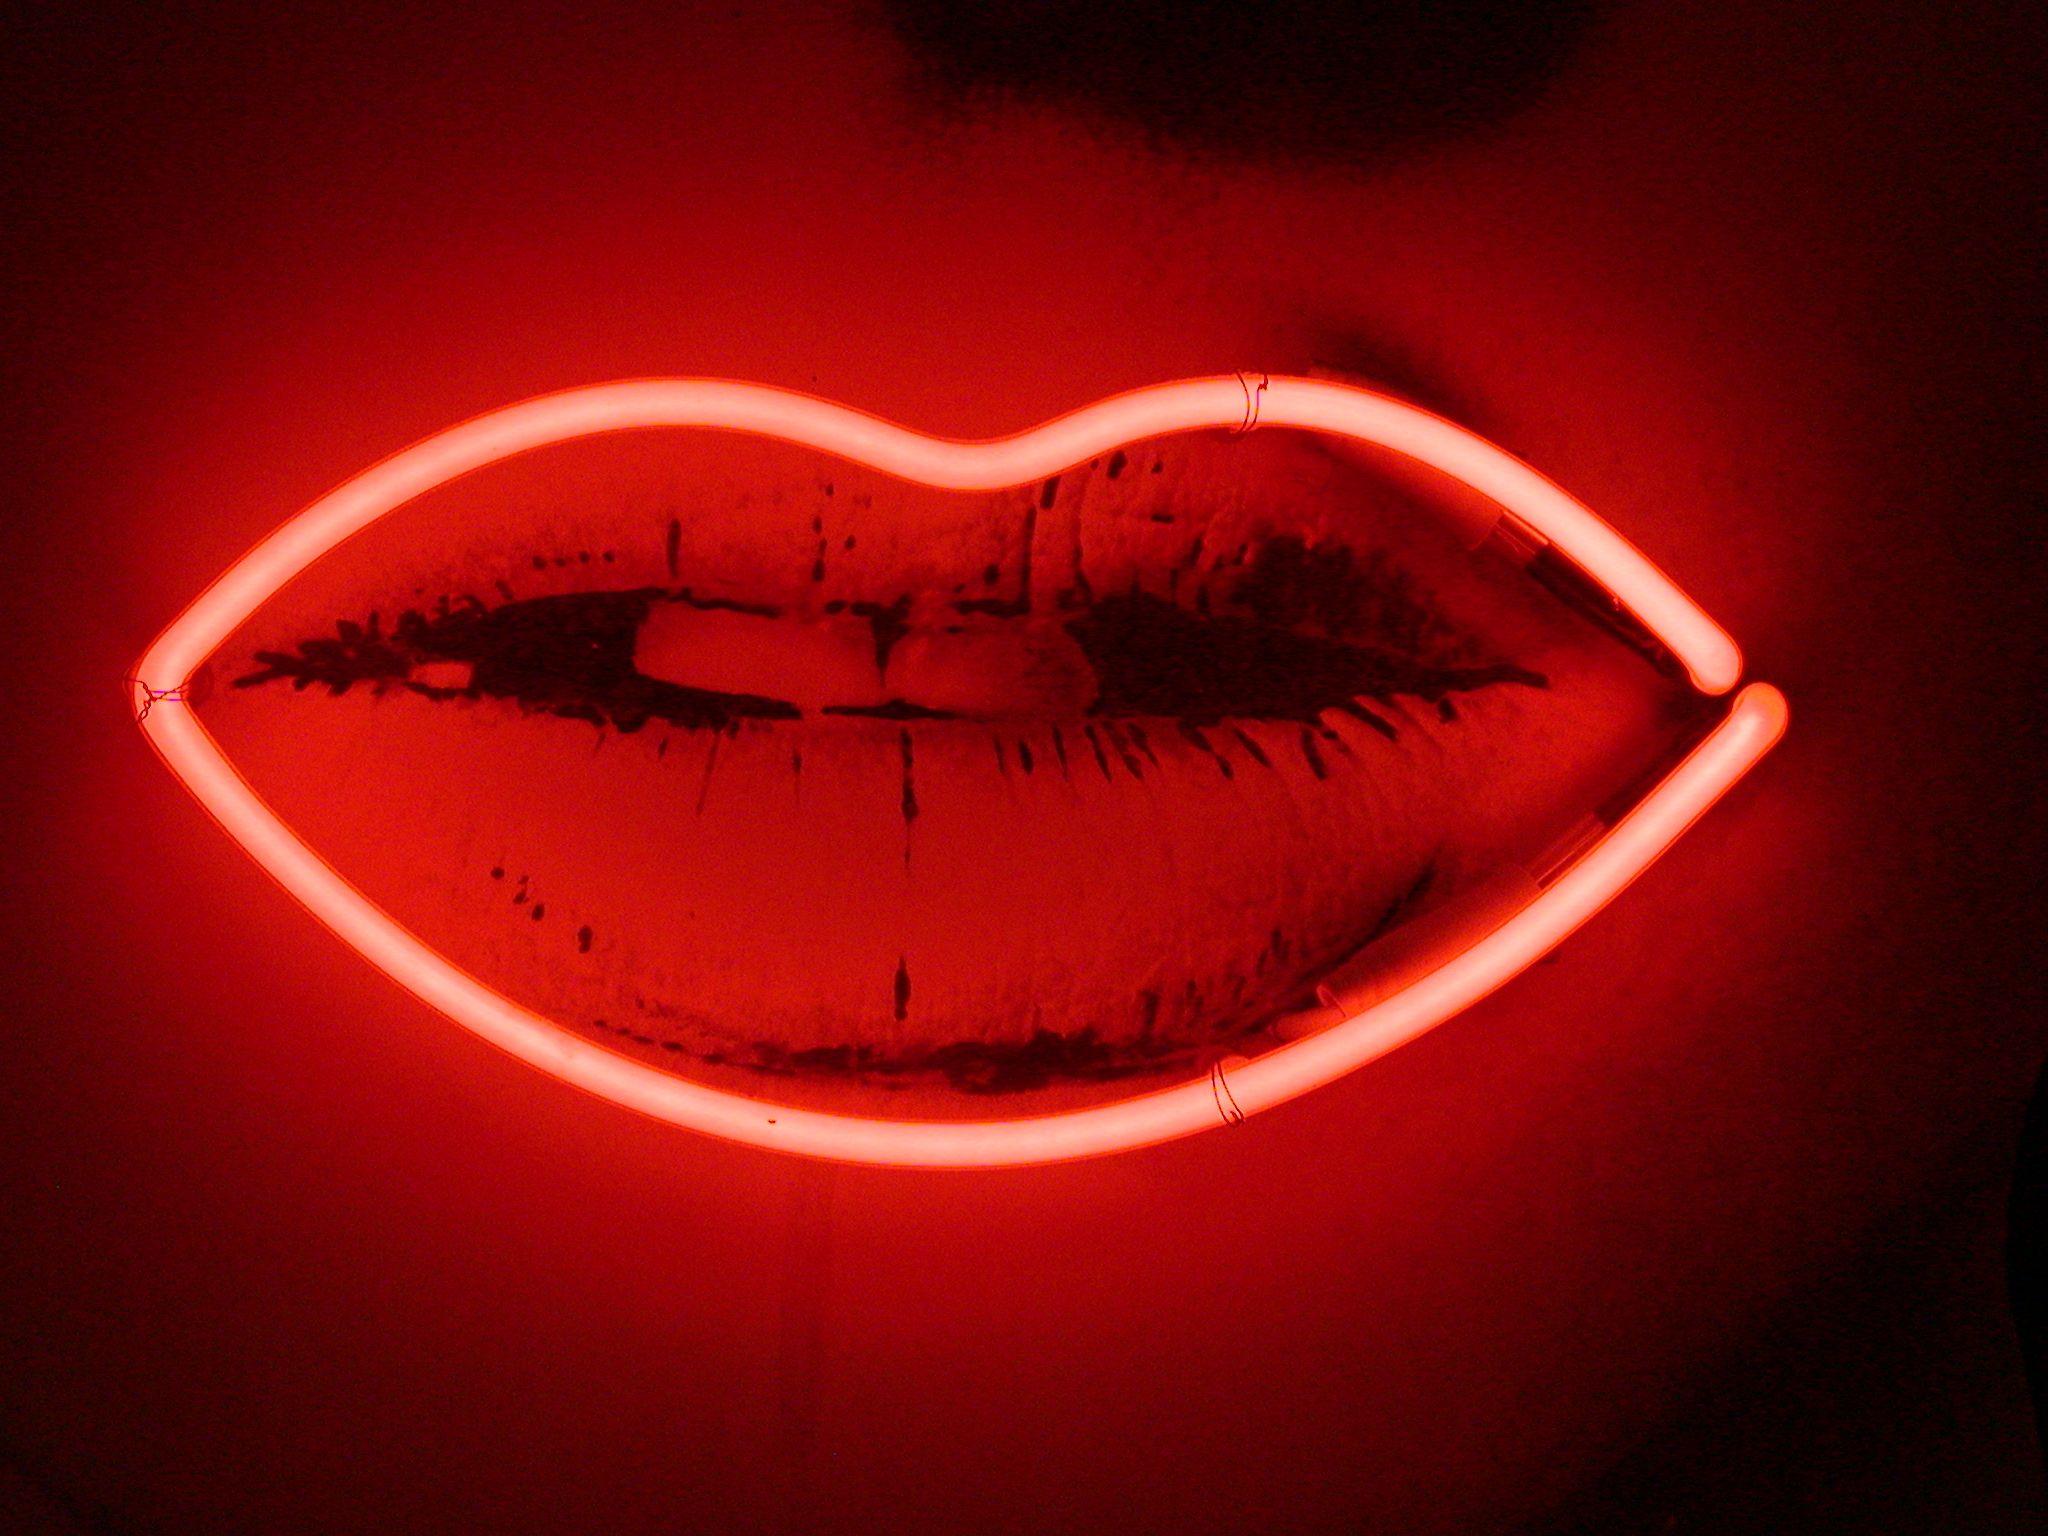 Image After Texture Lips Neon Artwork Red Light Neon Artwork